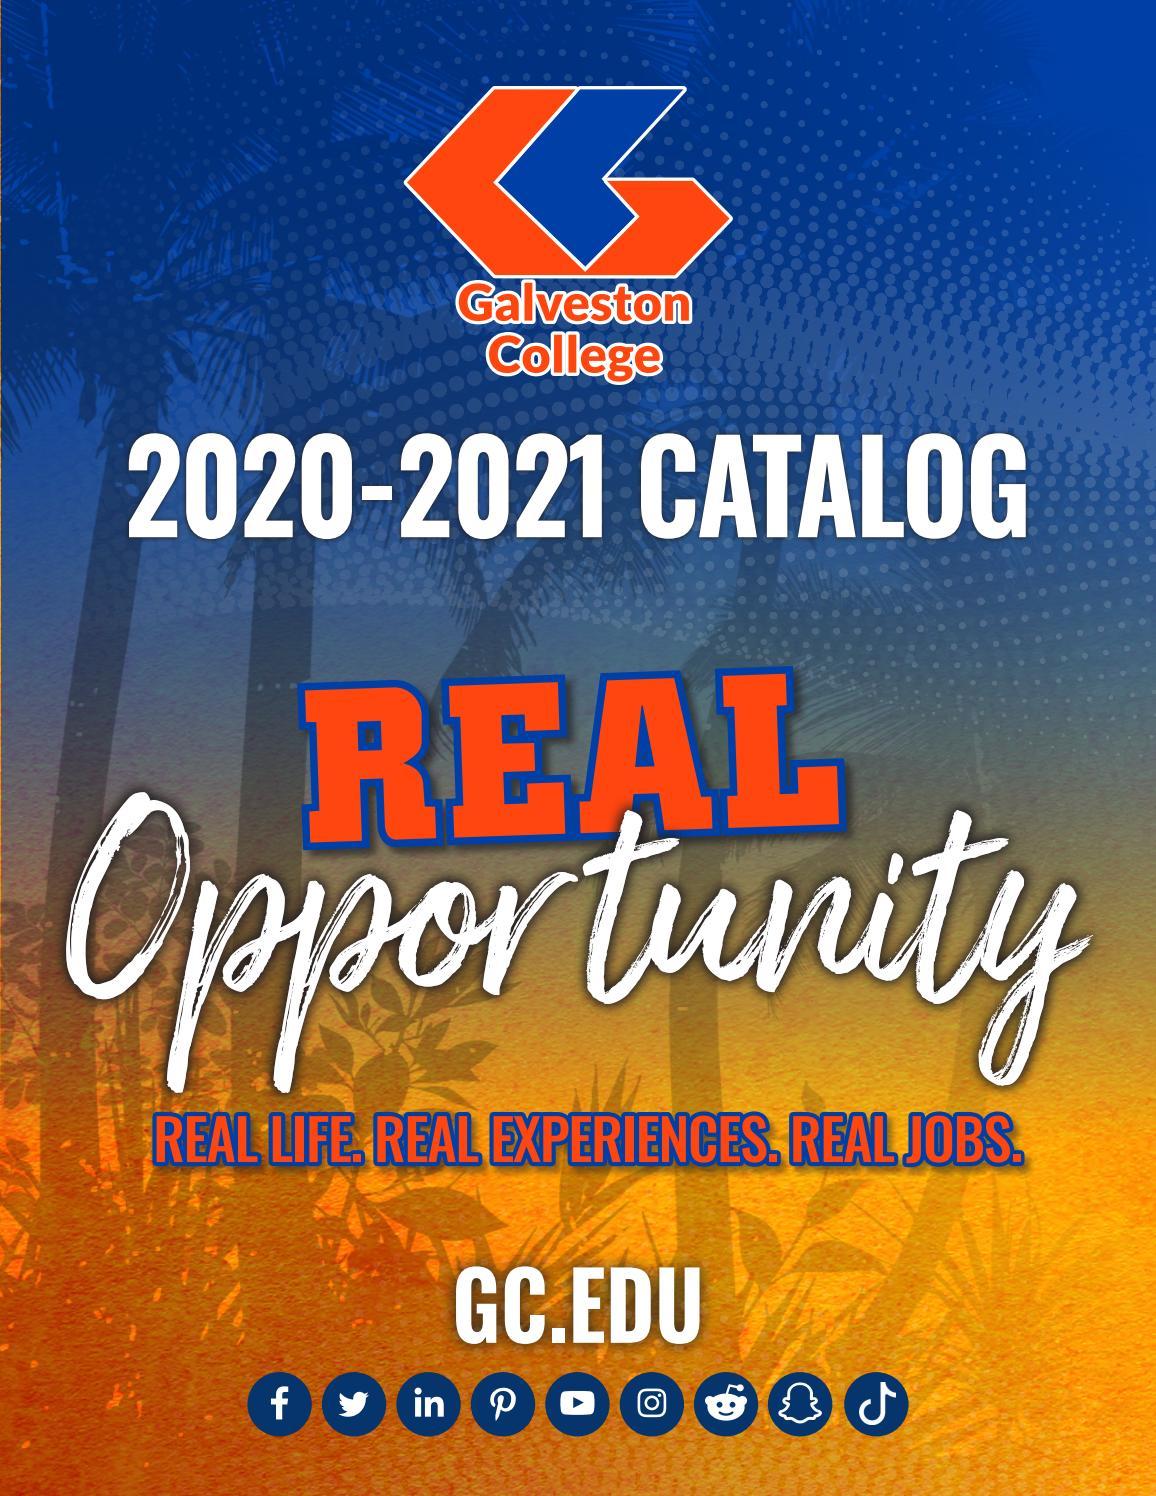 Csub Academic Calendar 2022.2020 2021 Galveston College Catalog By Galveston College Issuu